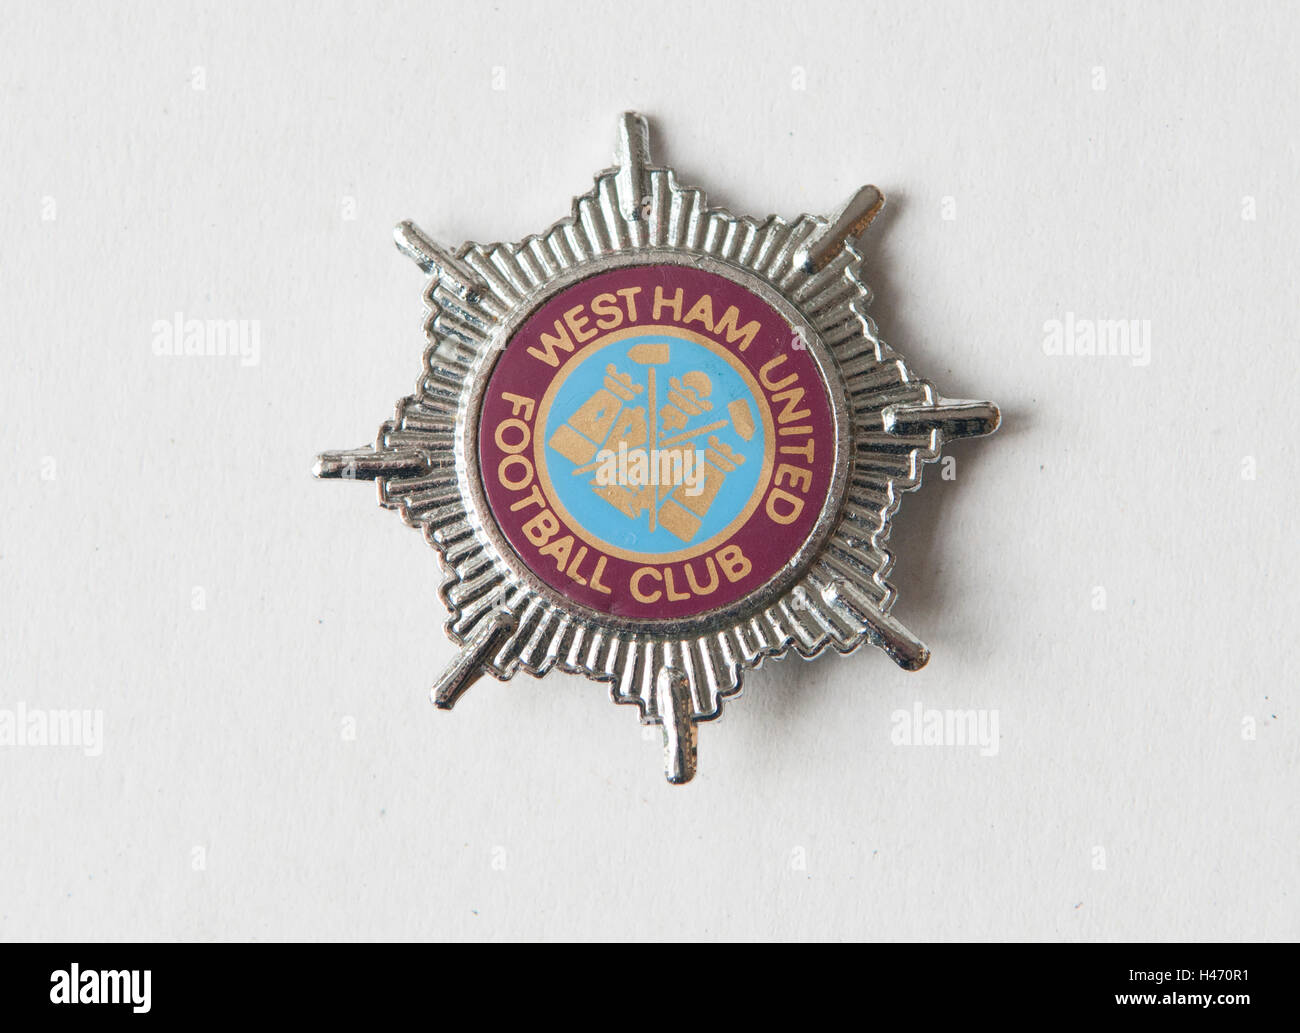 Westham United Football Club badge HOMER SYKES Imagen De Stock